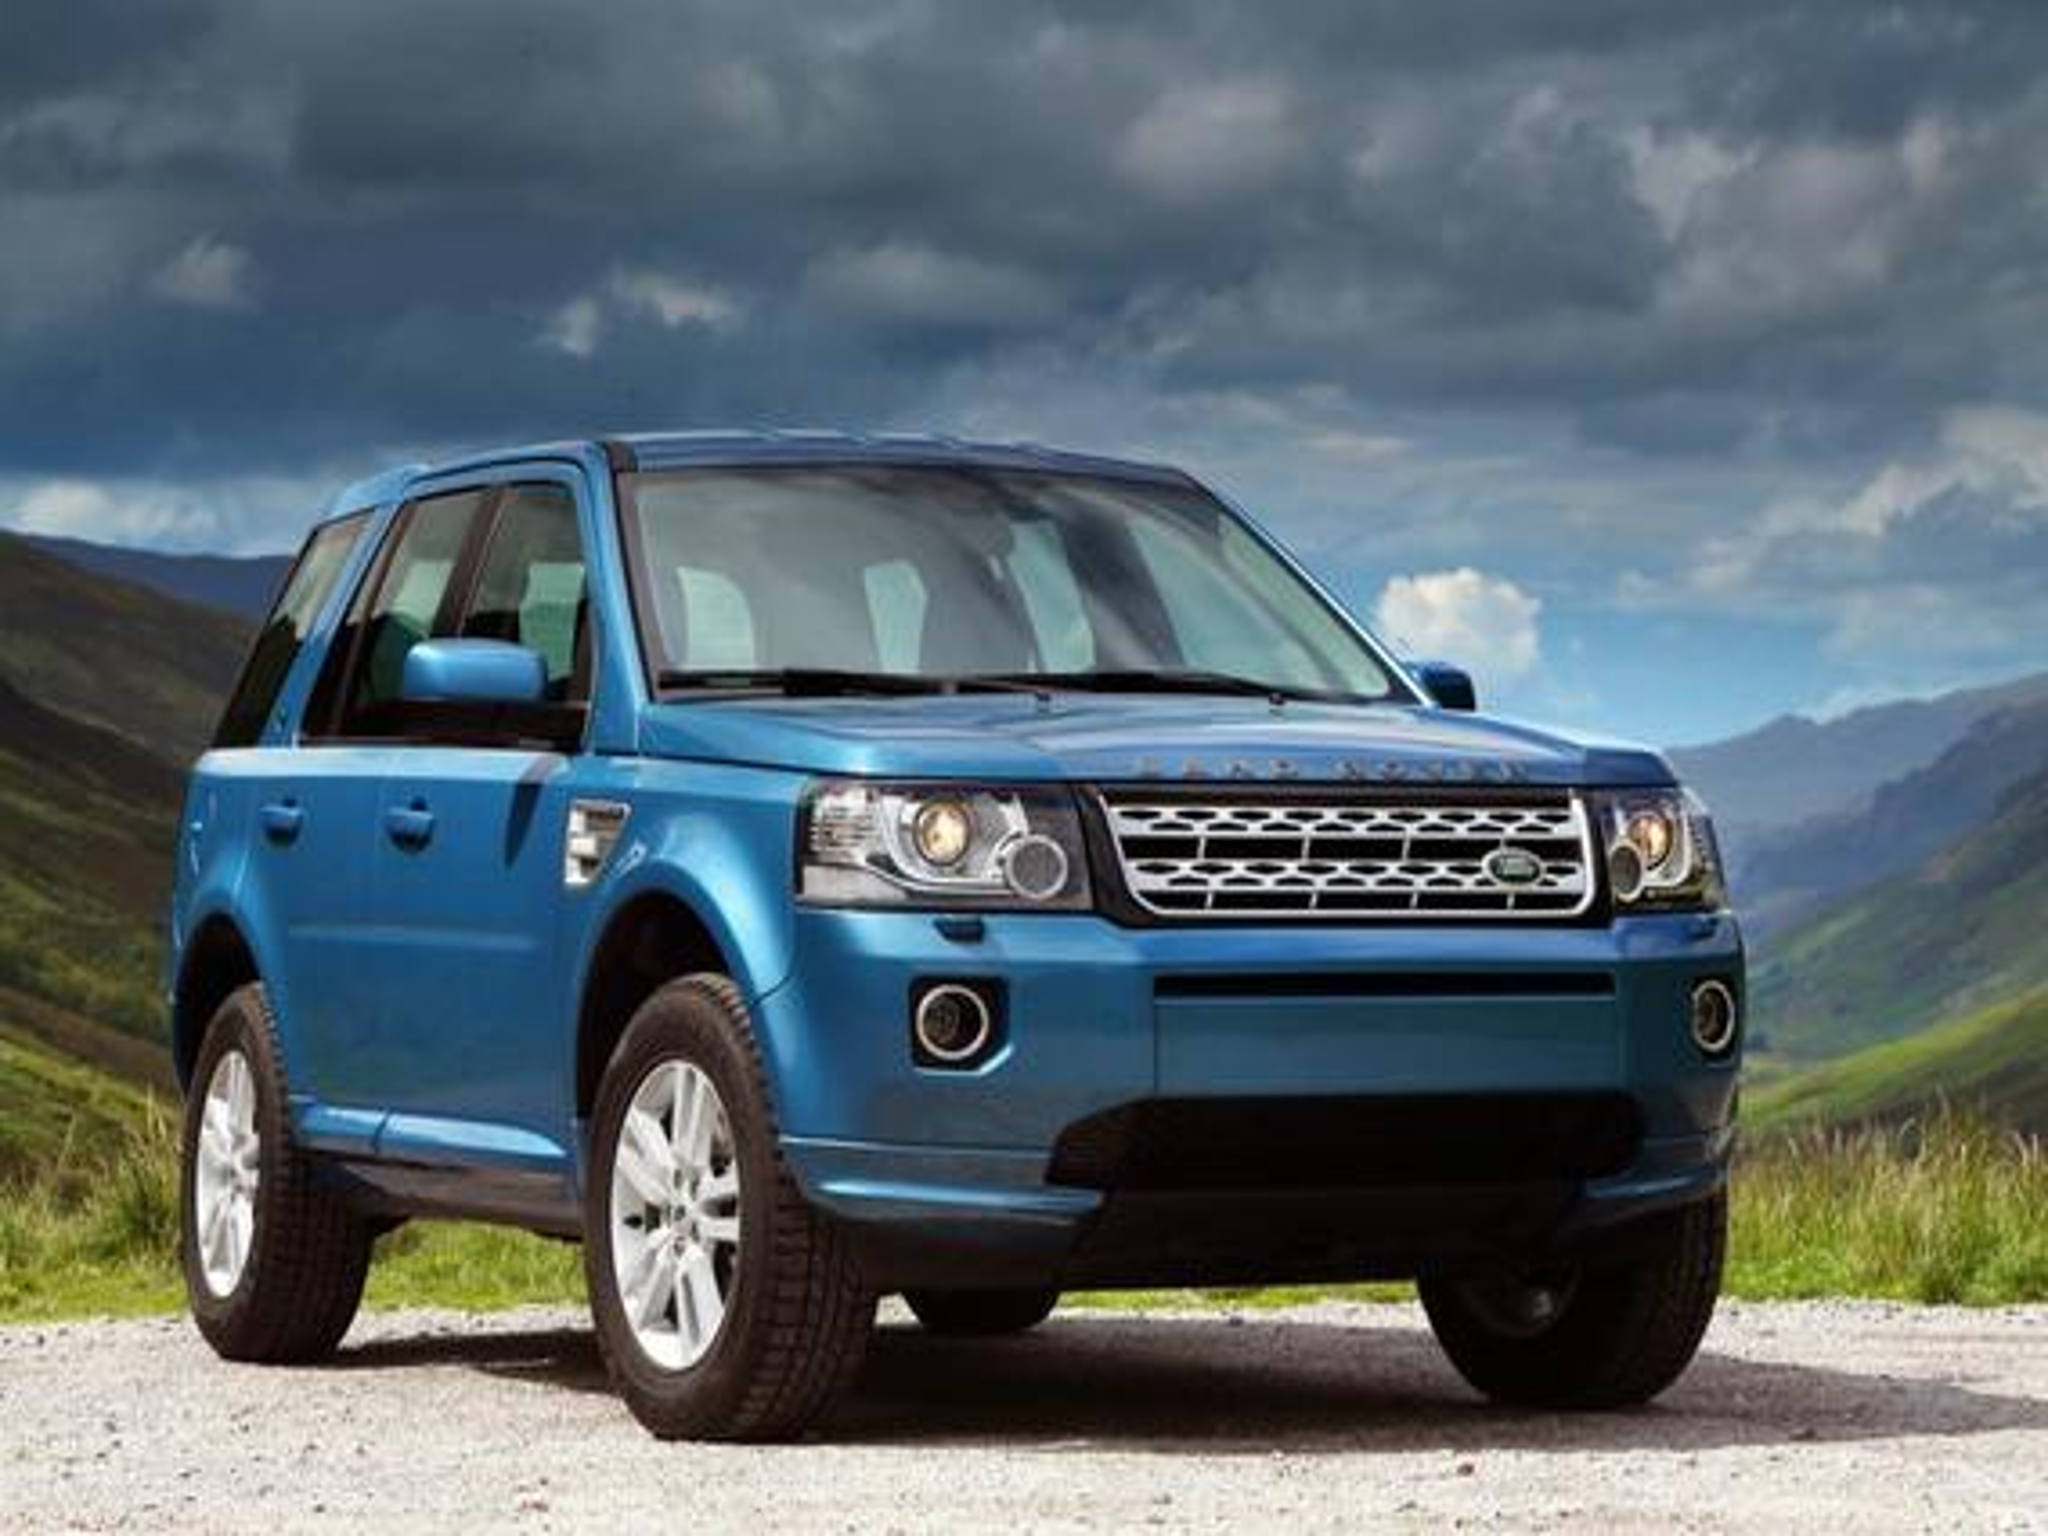 Land Rover Freelander II — описание модели